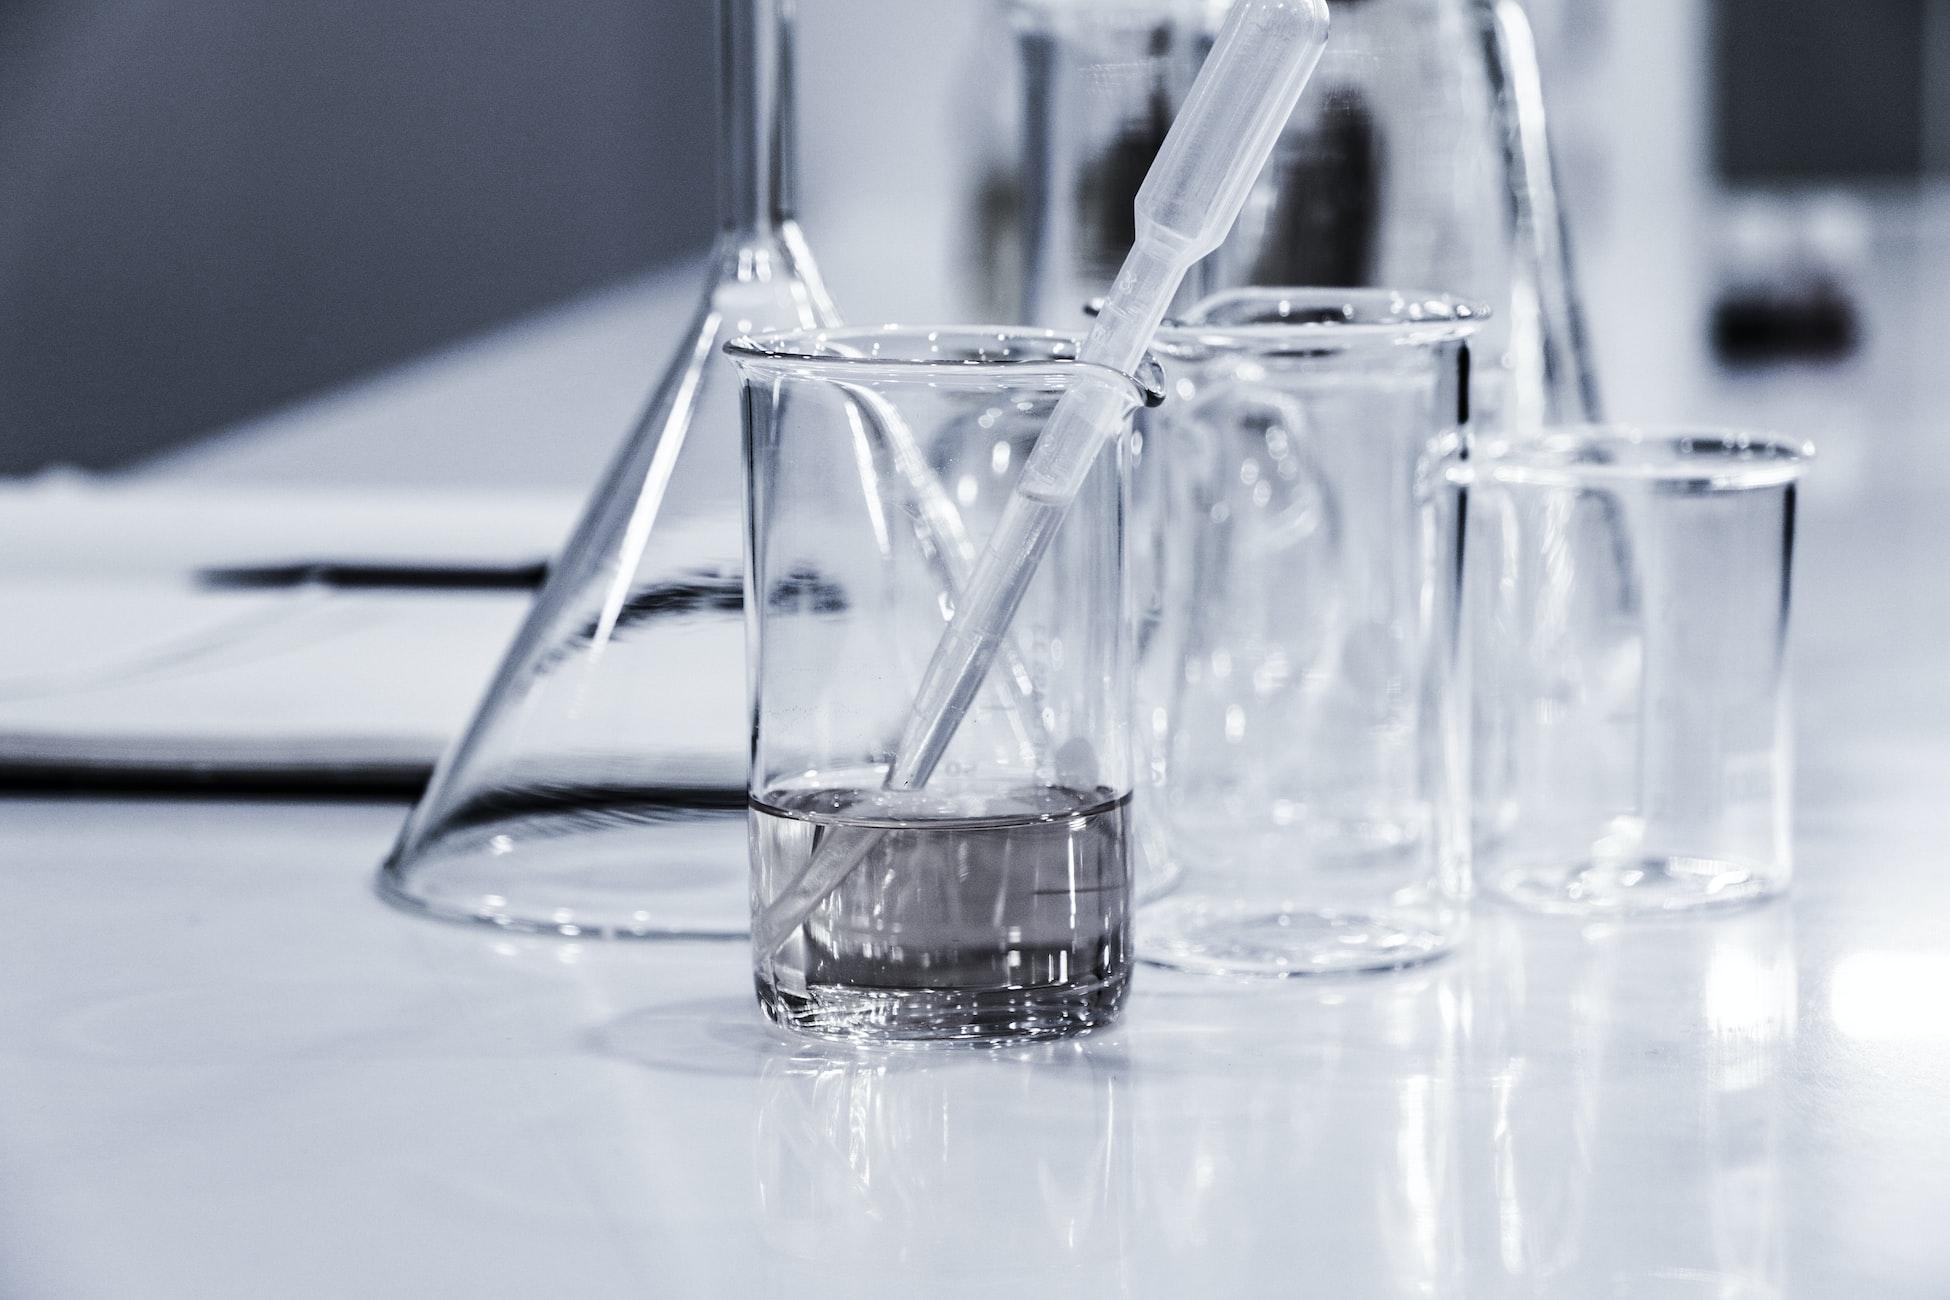 Labormaterialien aus Glas